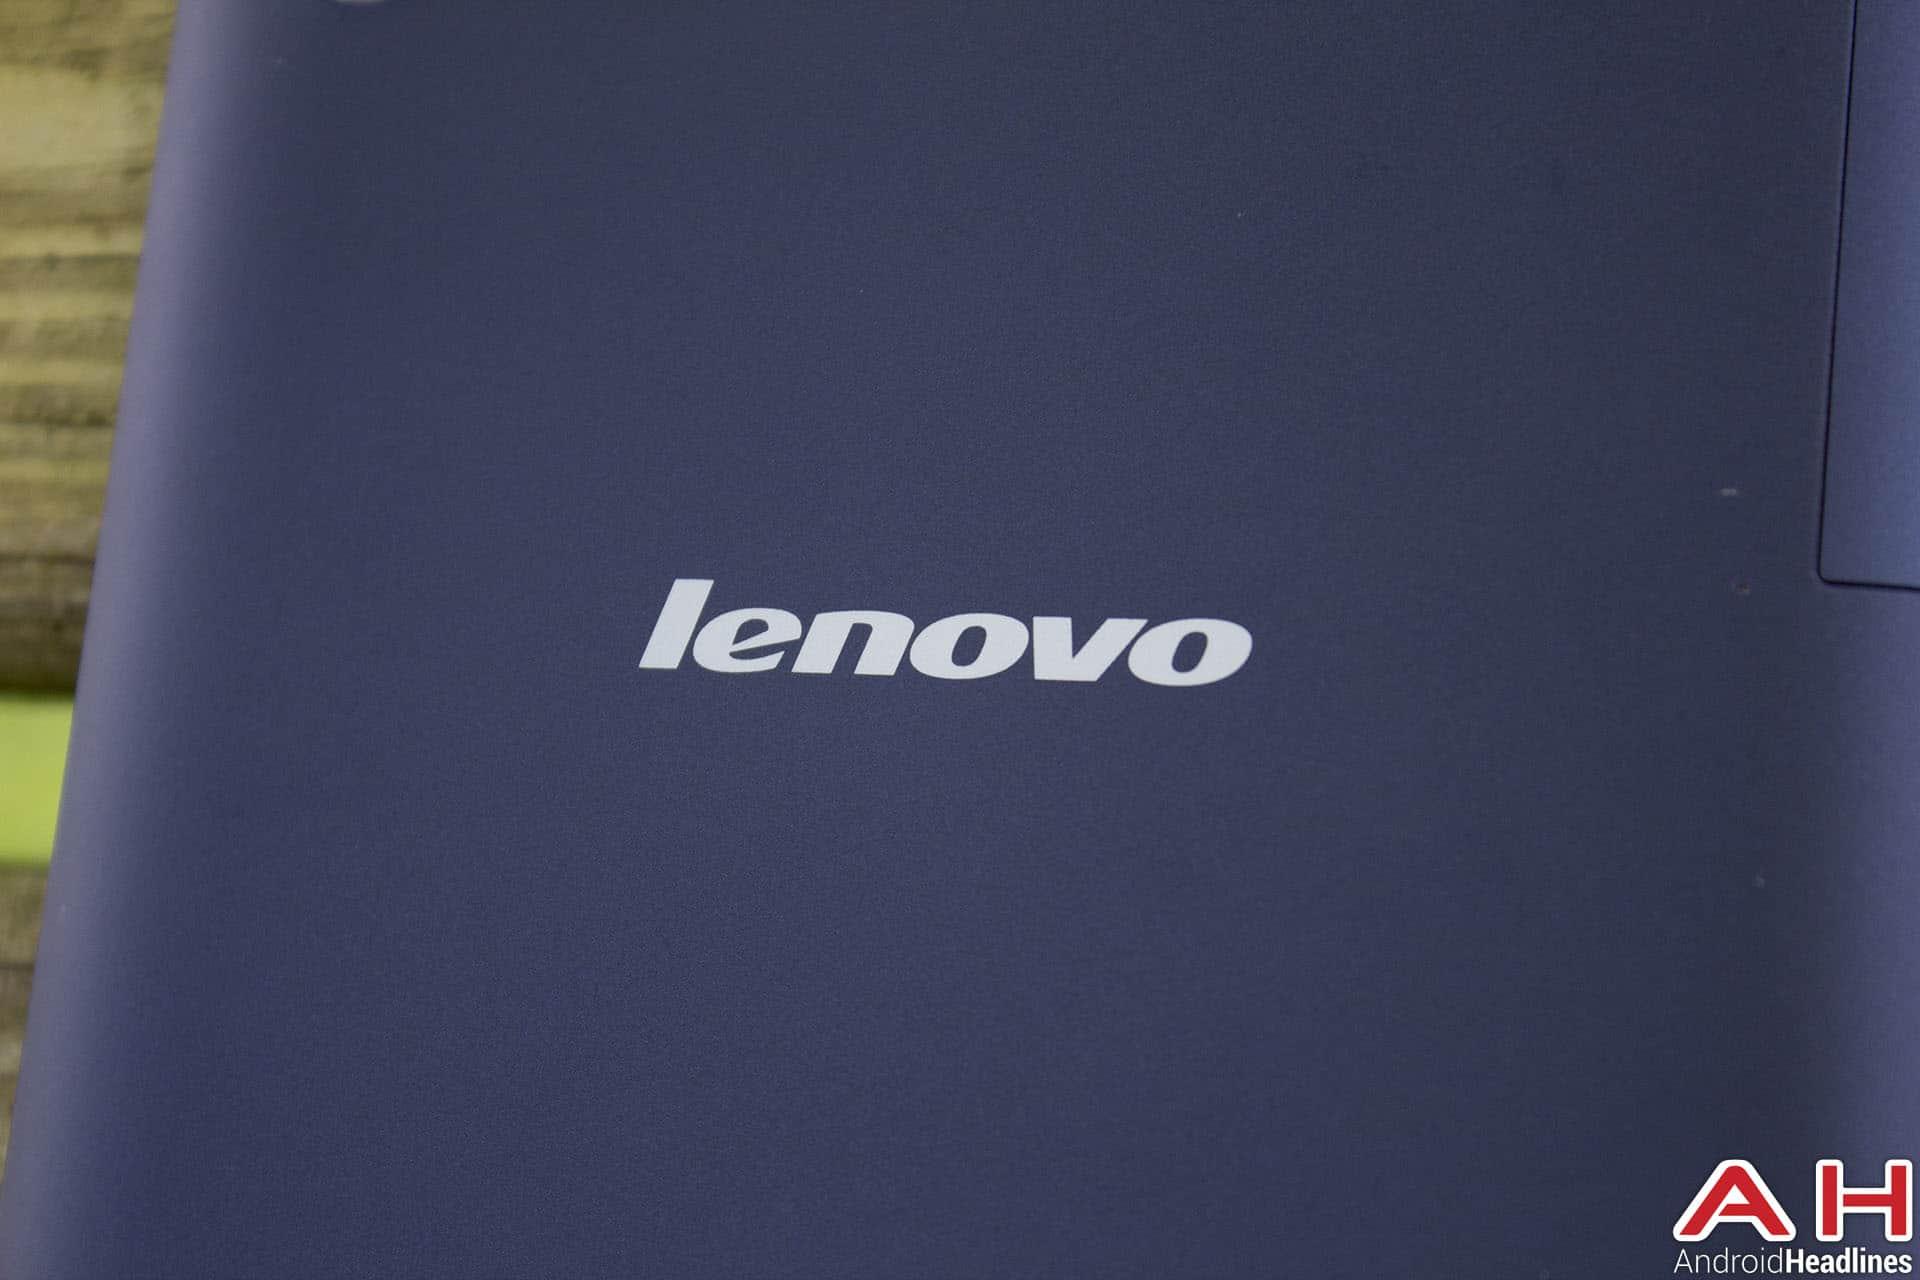 Lenovo-Tab-2-A8-Review-AH-logo-3